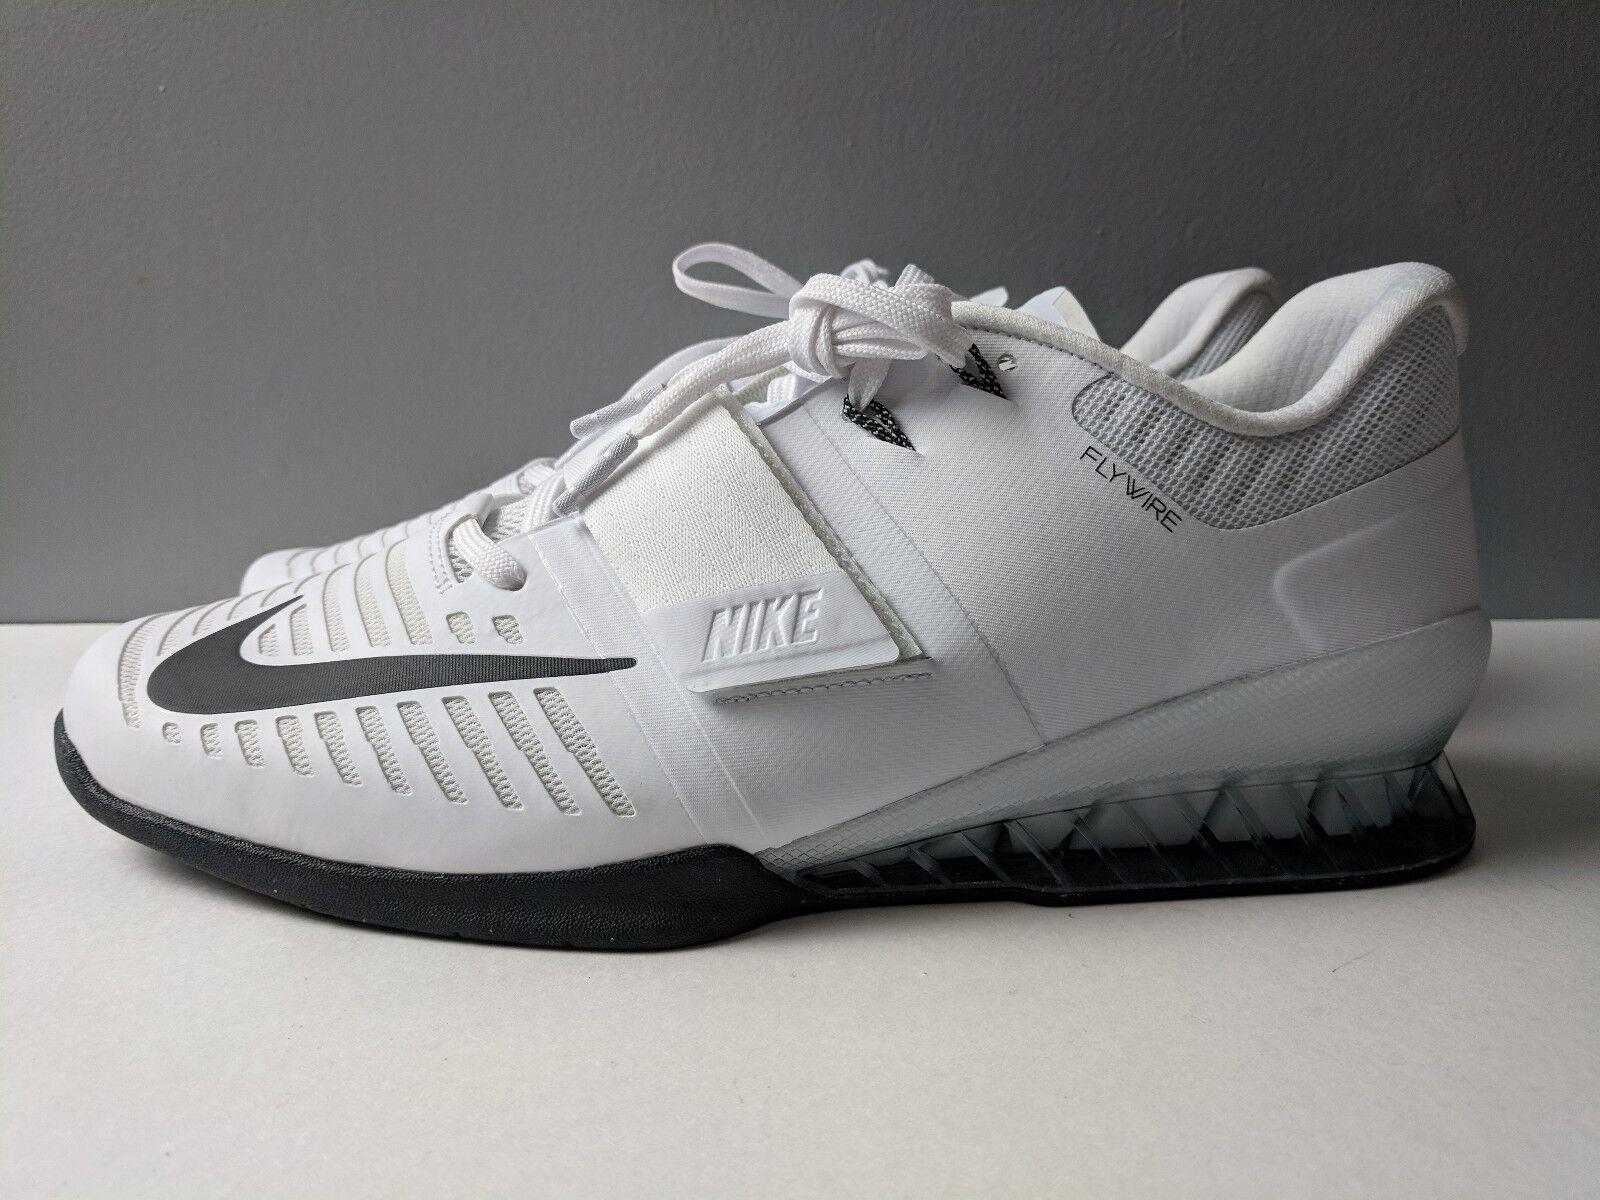 Nike hombre romaleos negro 3 halterofilia zapatos blanco negro romaleos comodo acf58f